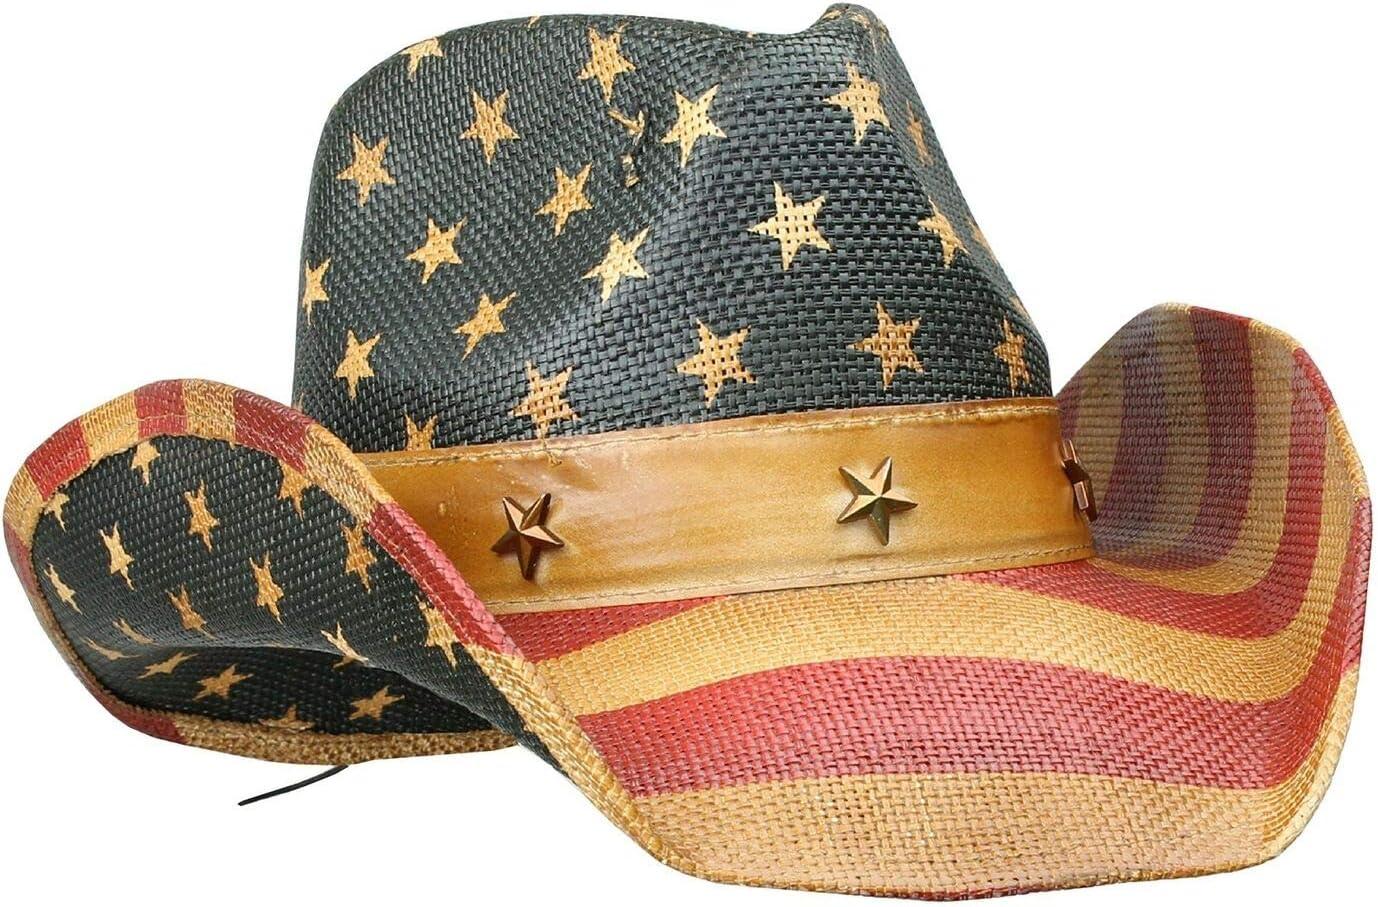 COREGEAR Patriot Men's Vintage Tea-Stained USA American Flag Cowboy Hat w/Western Shape-It Brim